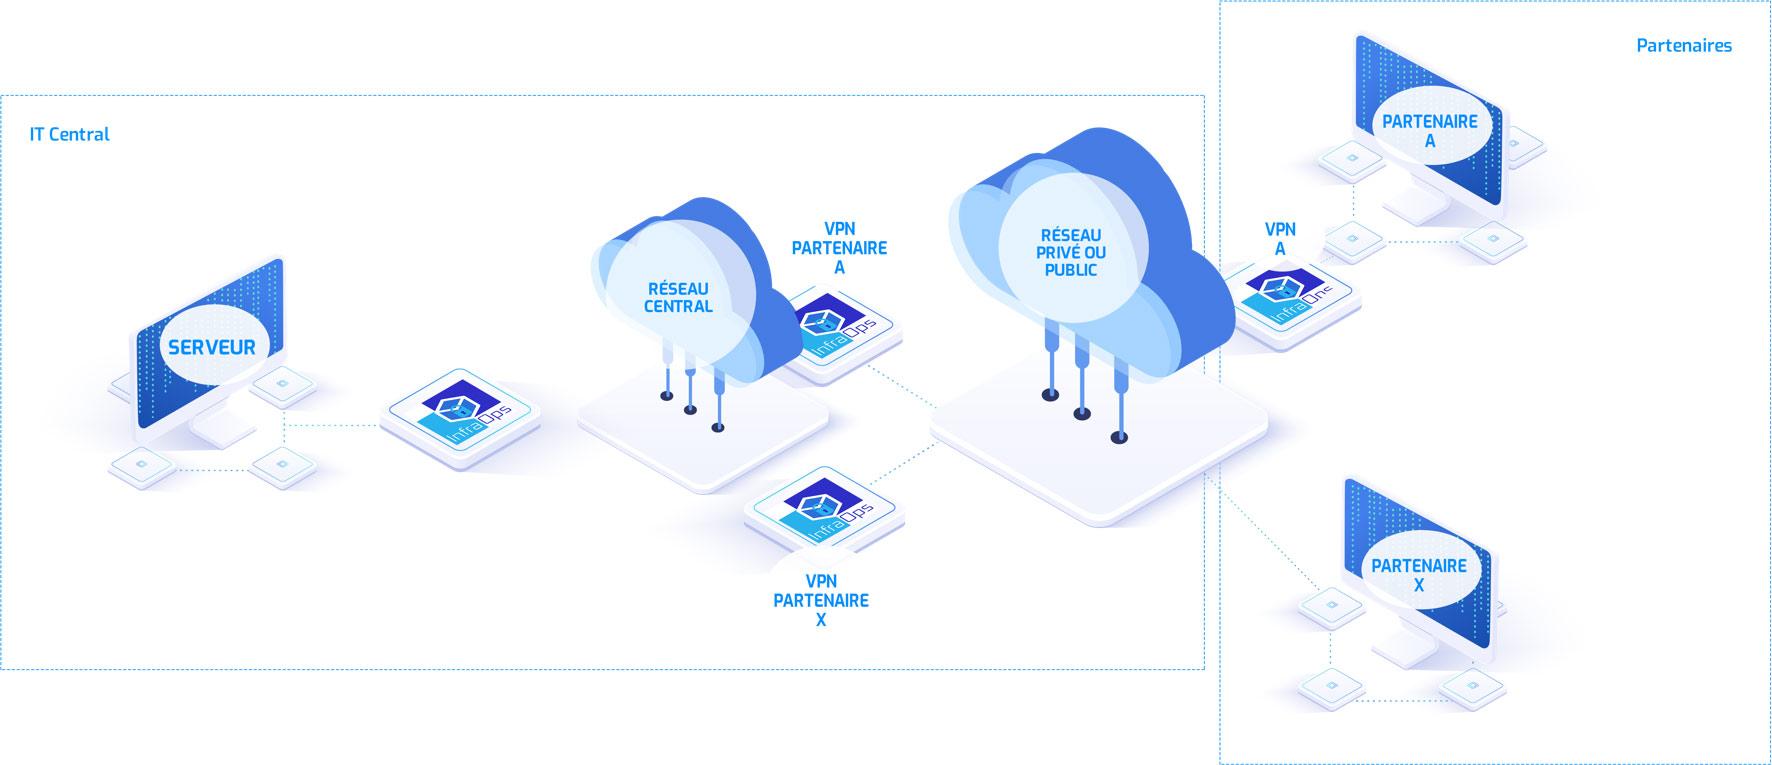 Connexion de partenaires/VPNs